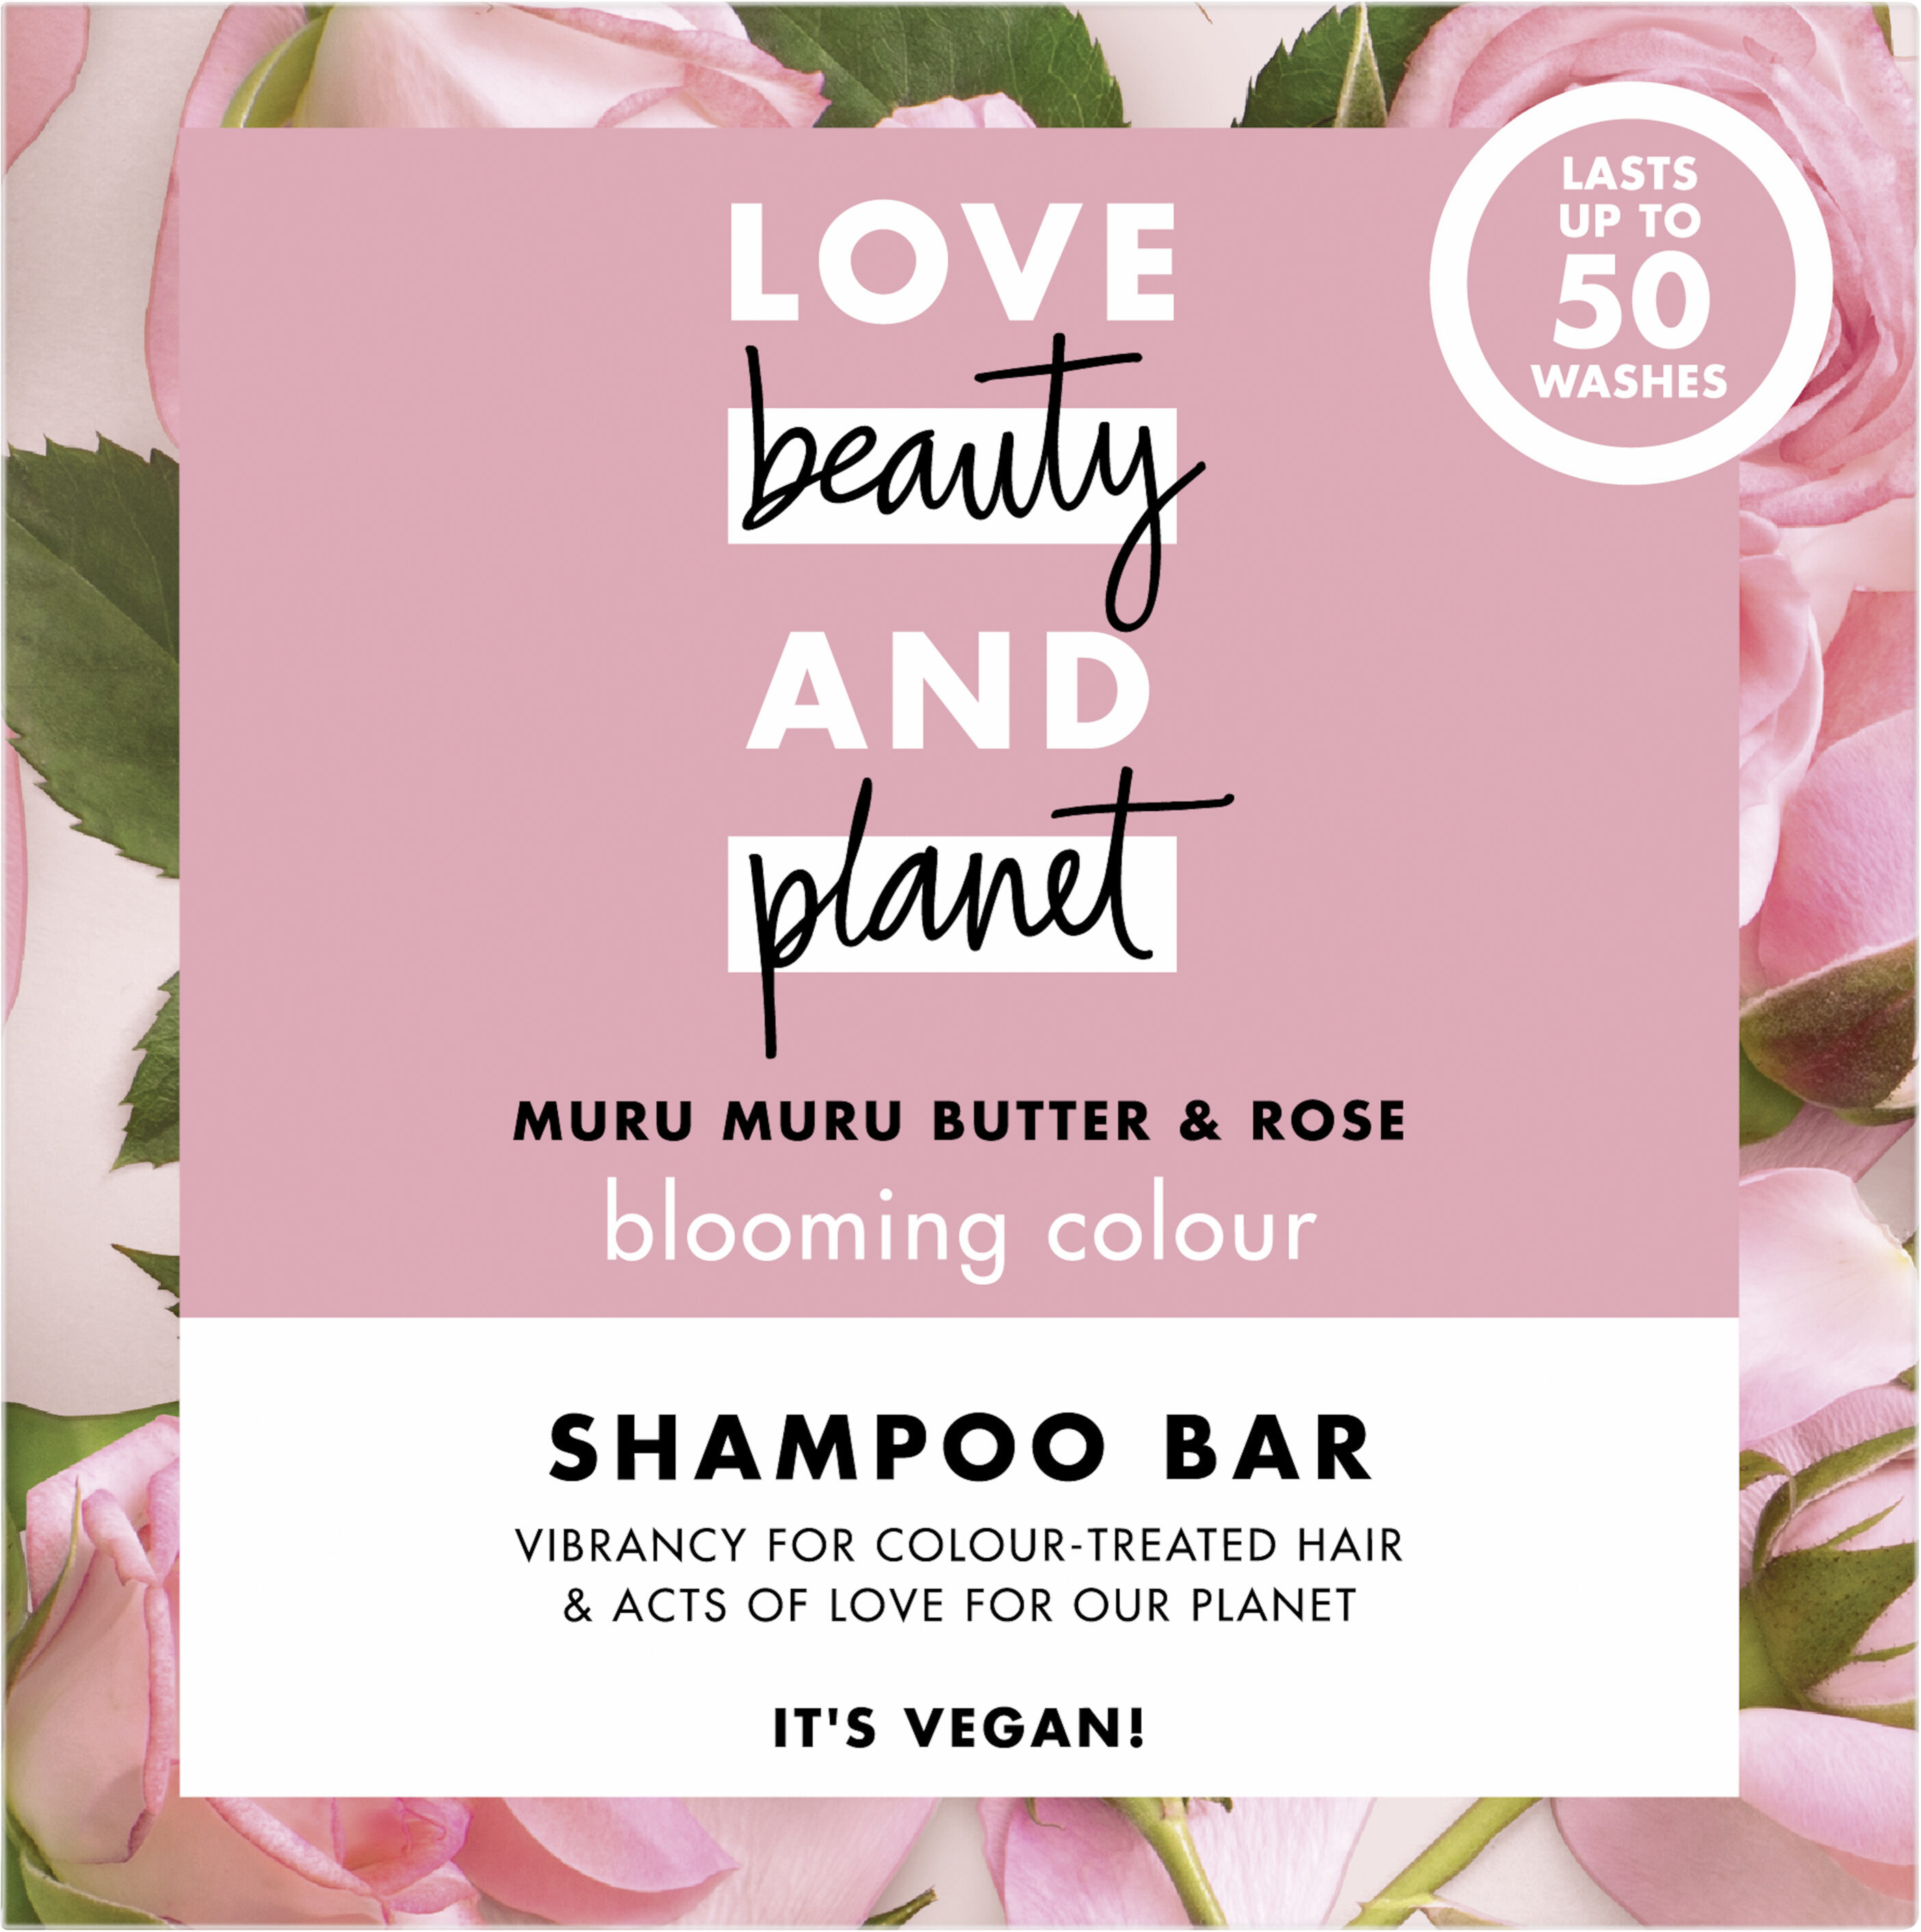 Love Beauty And Planet Shampooing Solide Éclosion de Couleur Muru Muru & Rose - Product - fr